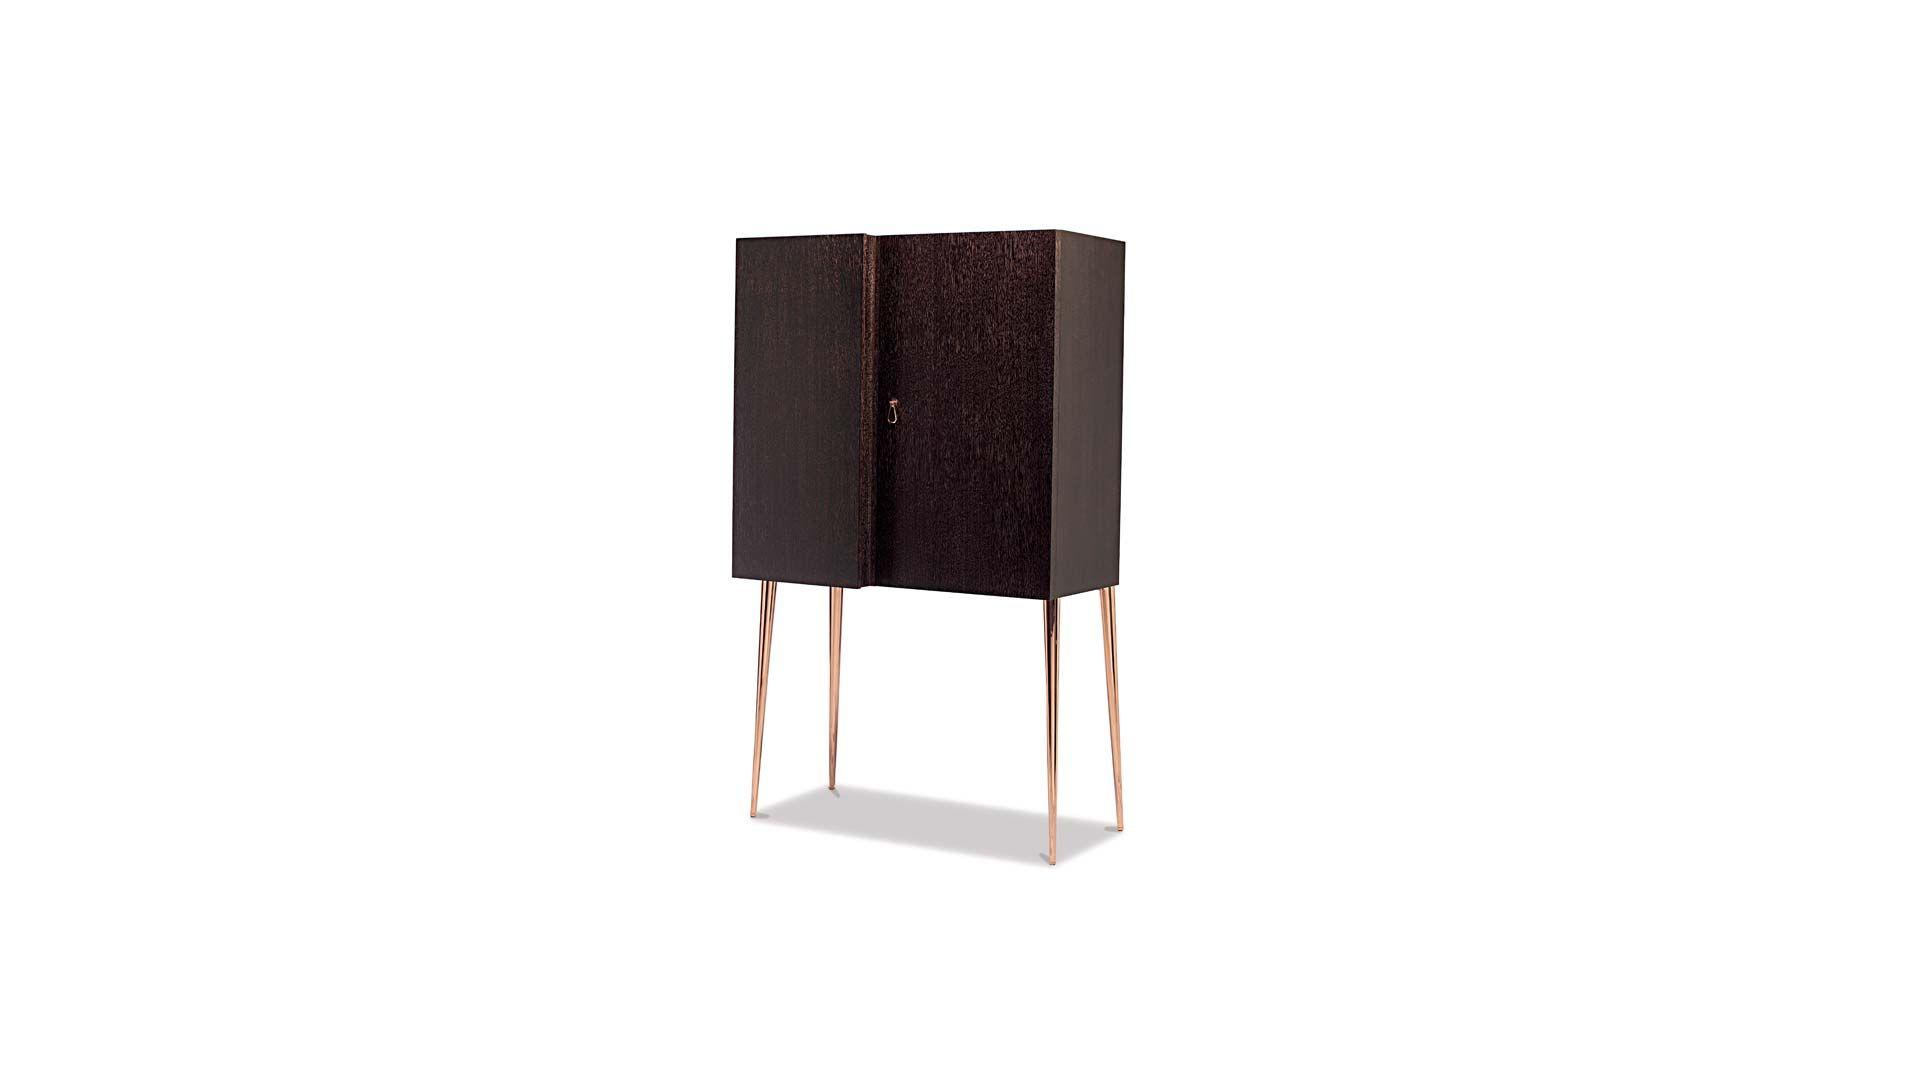 City Cabinet piedi alti - Living room furniture - Cantori